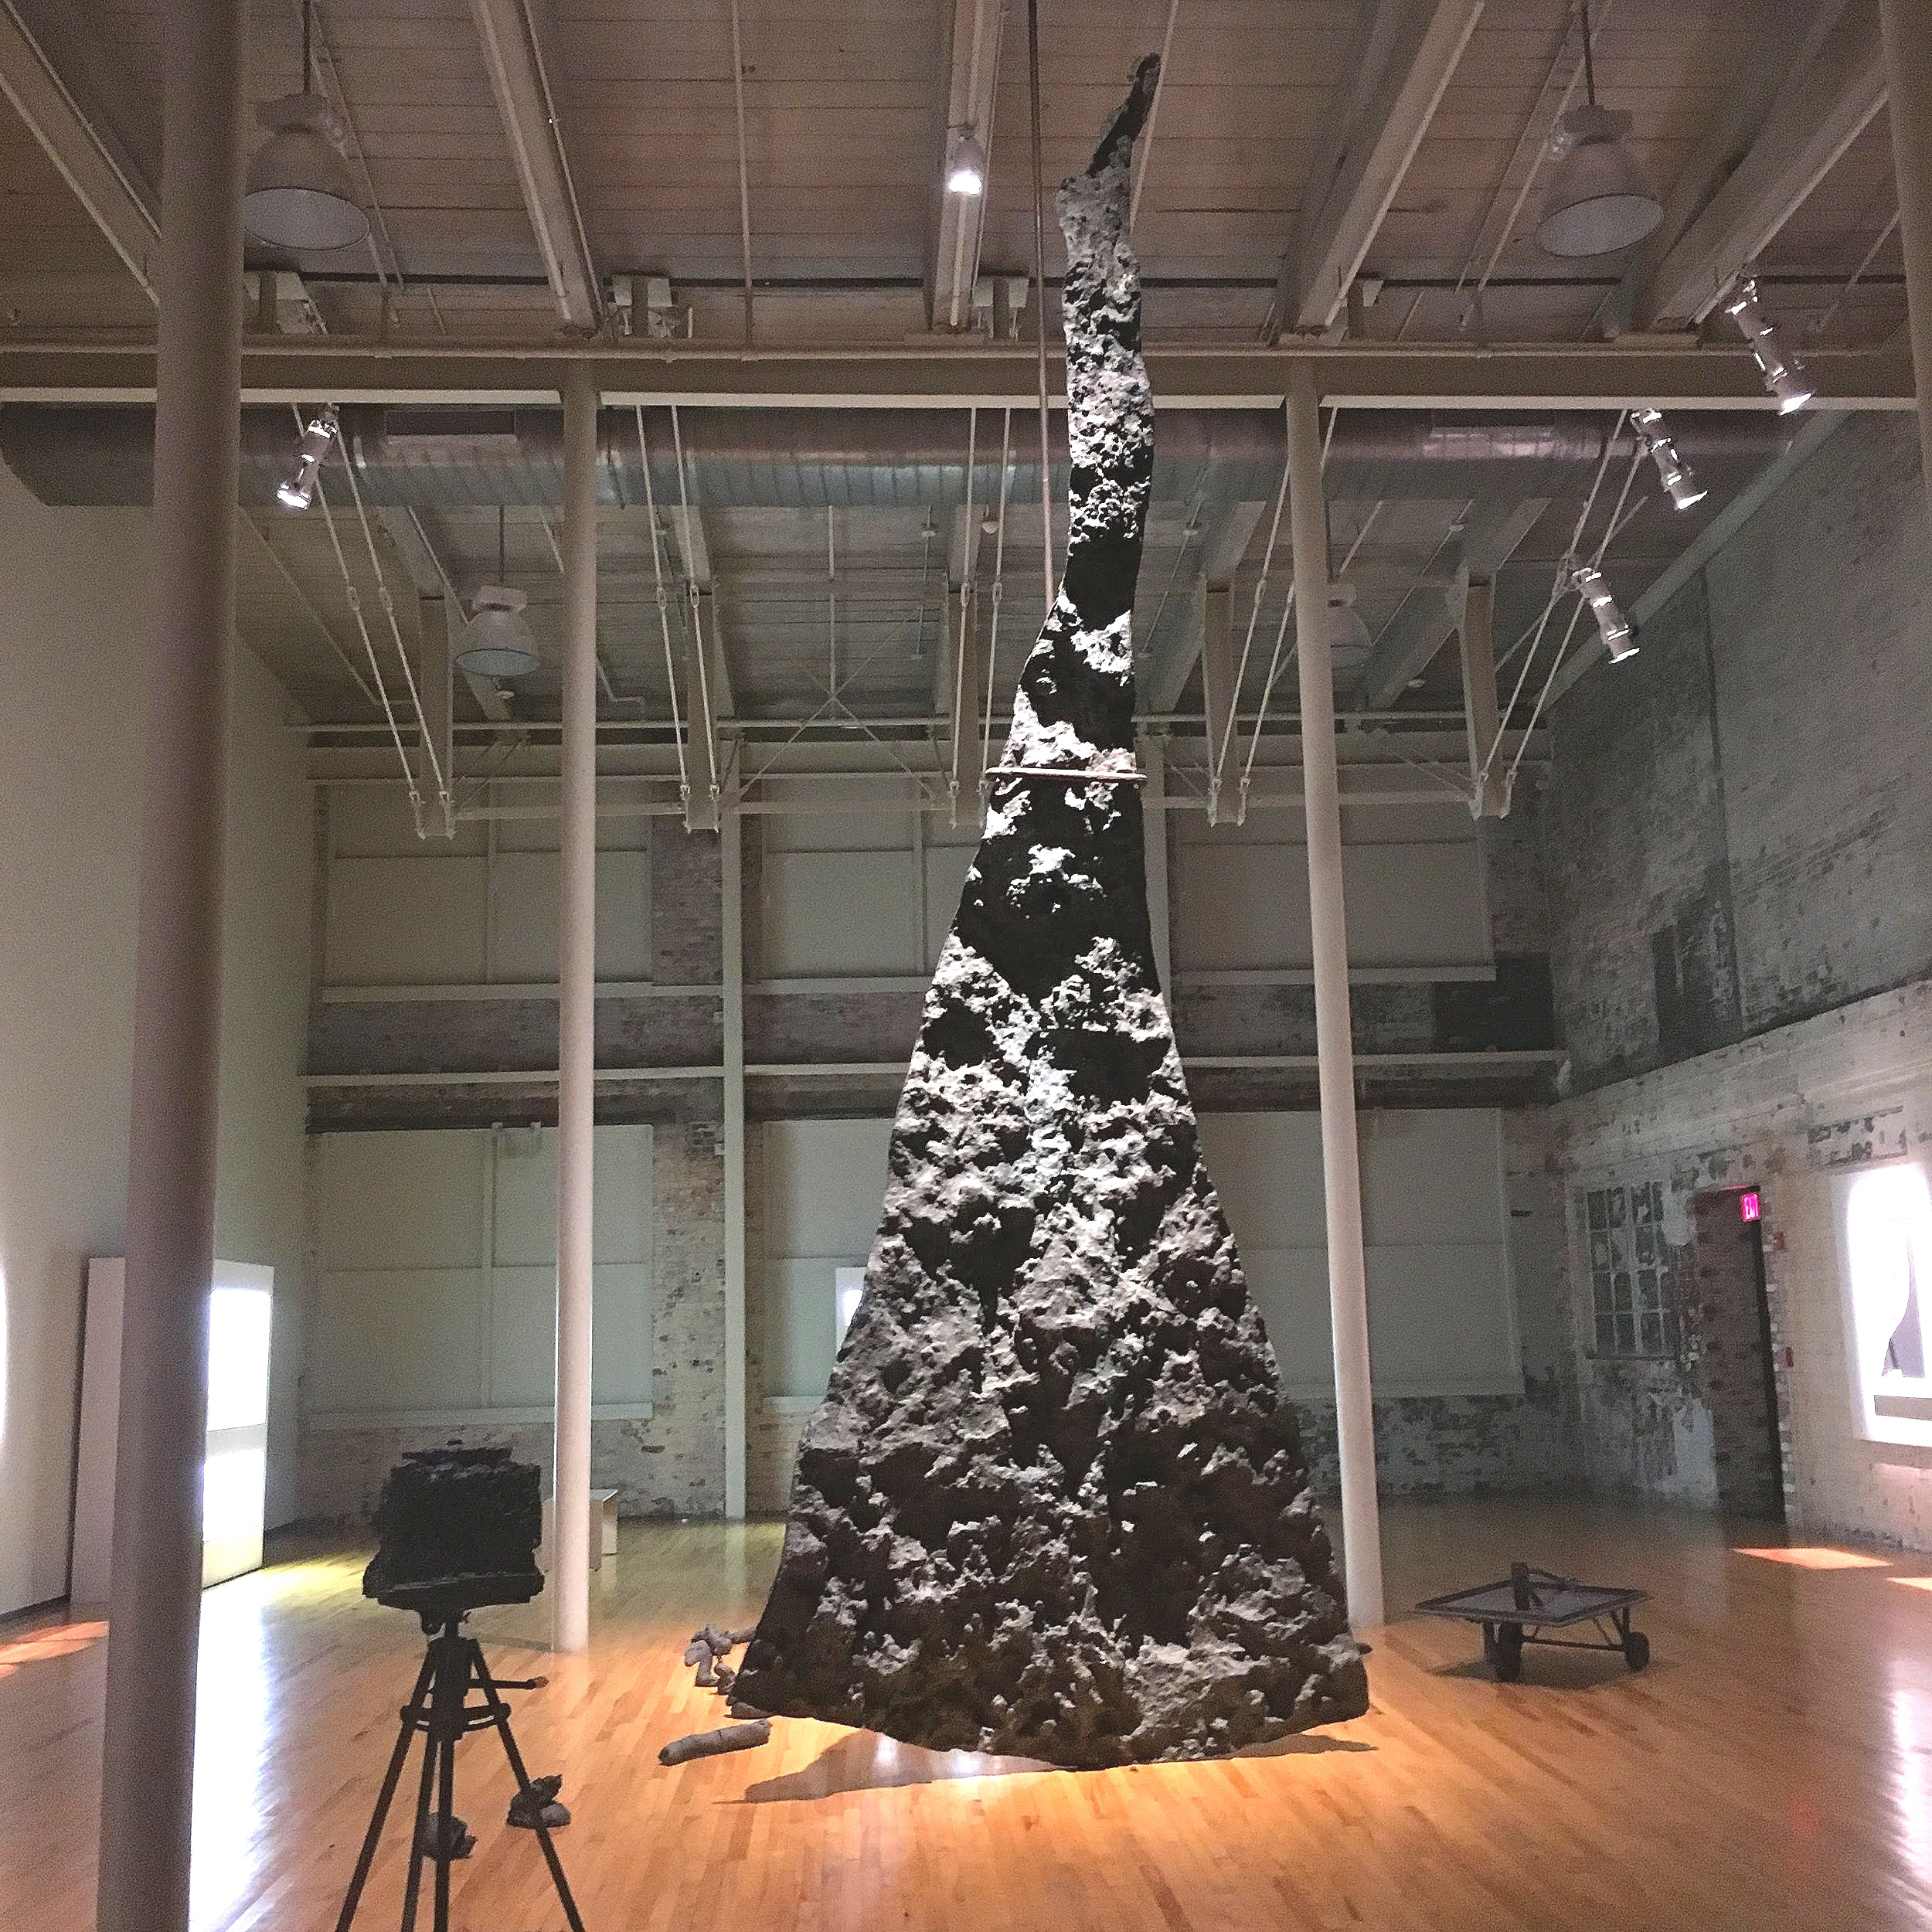 Joseph Beuys at Mass MoCA